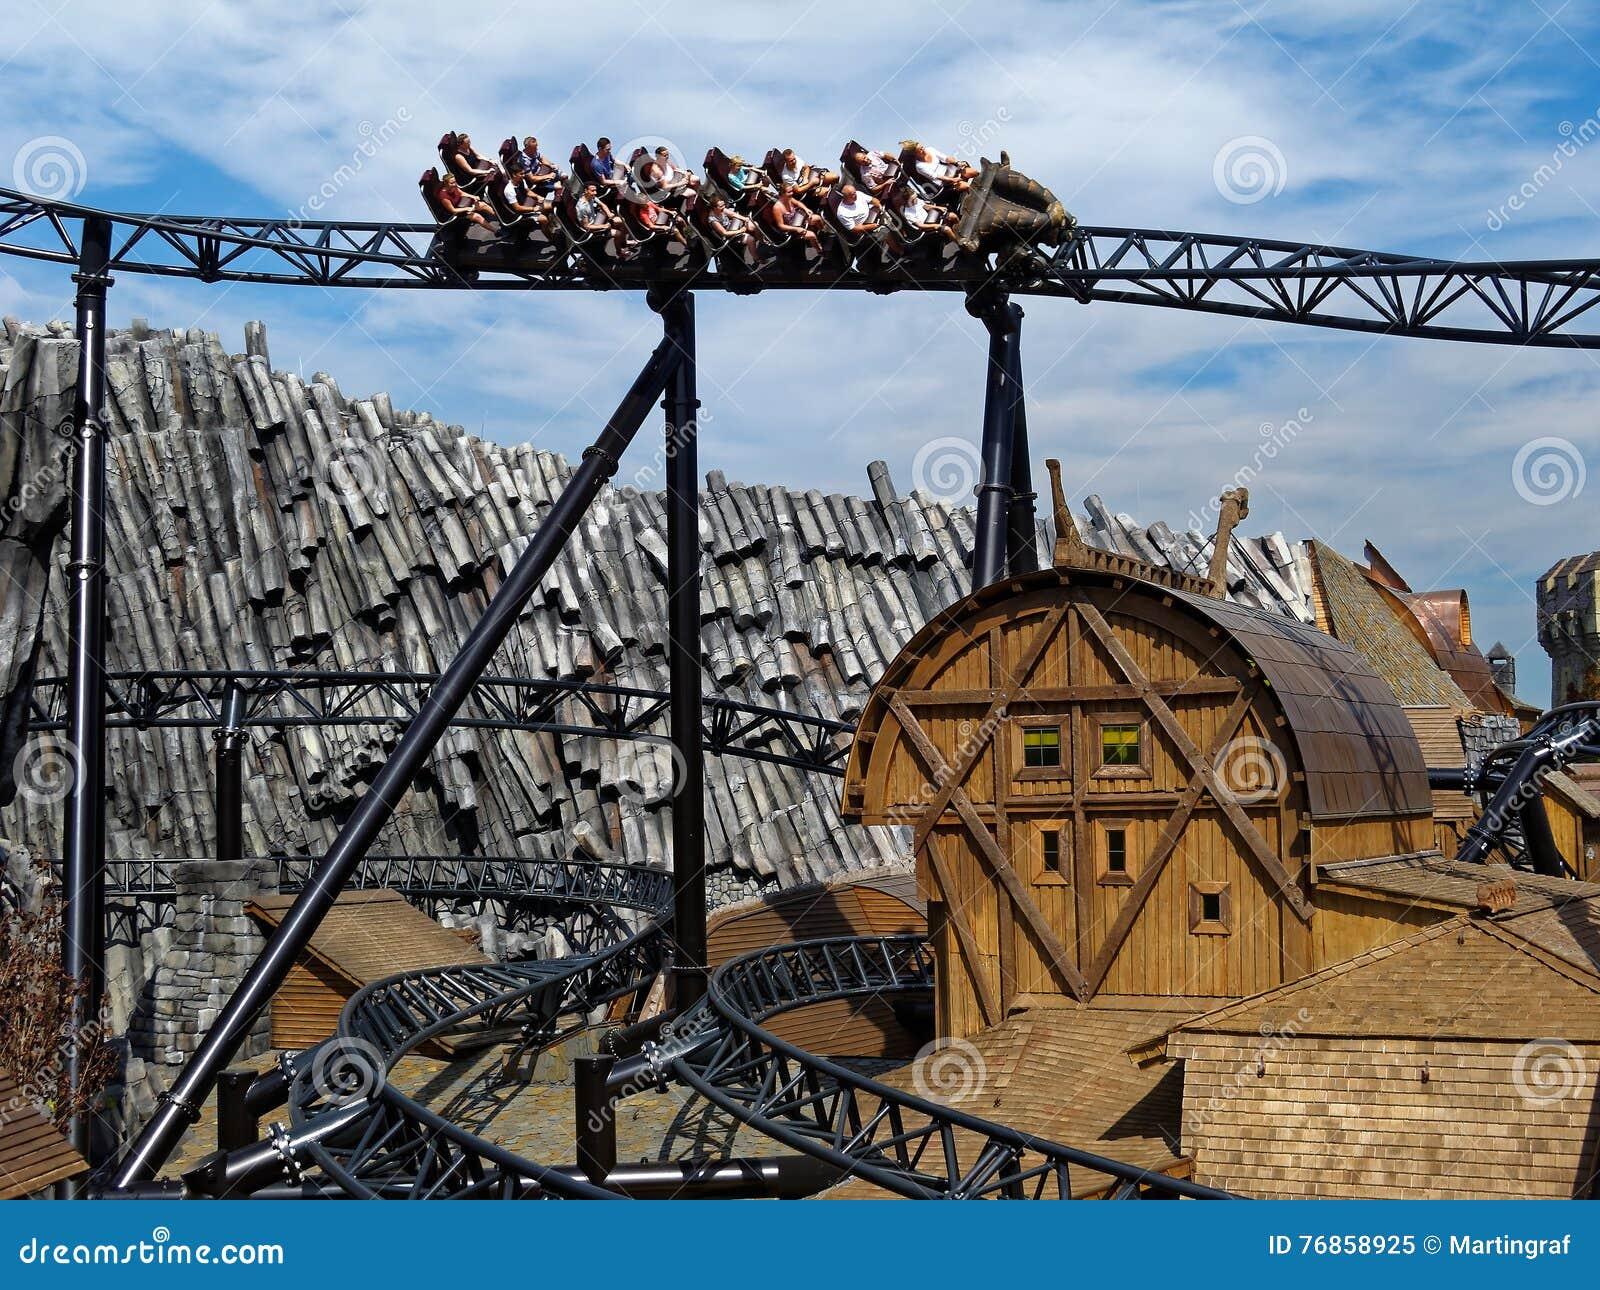 Roller coaster ride Taron in themed world Klugheim